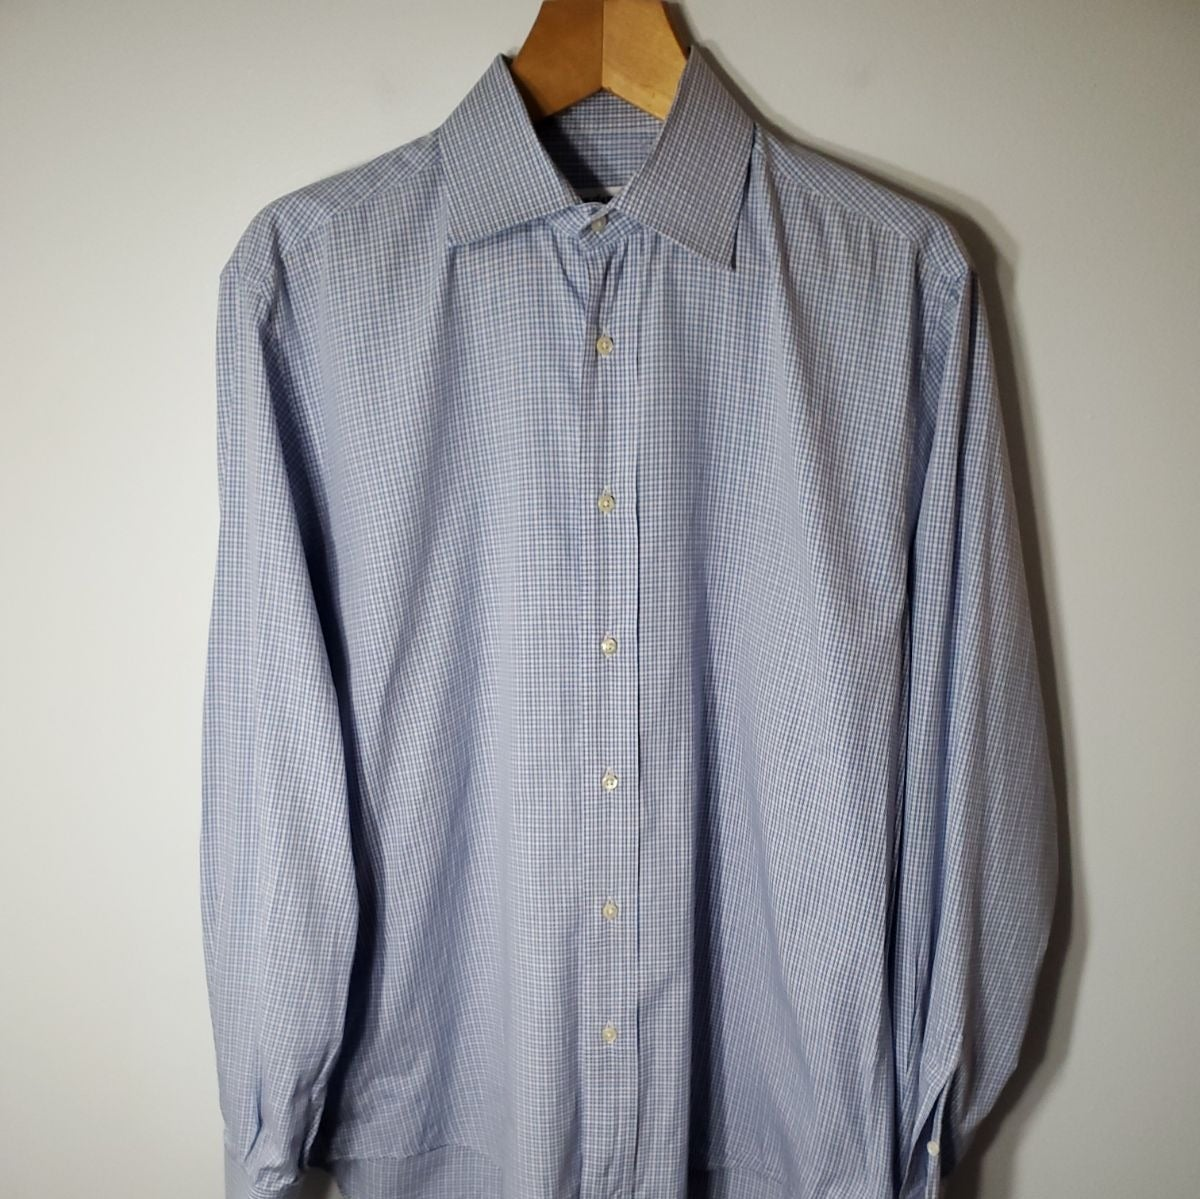 YSL Micro Check Dress Shirt